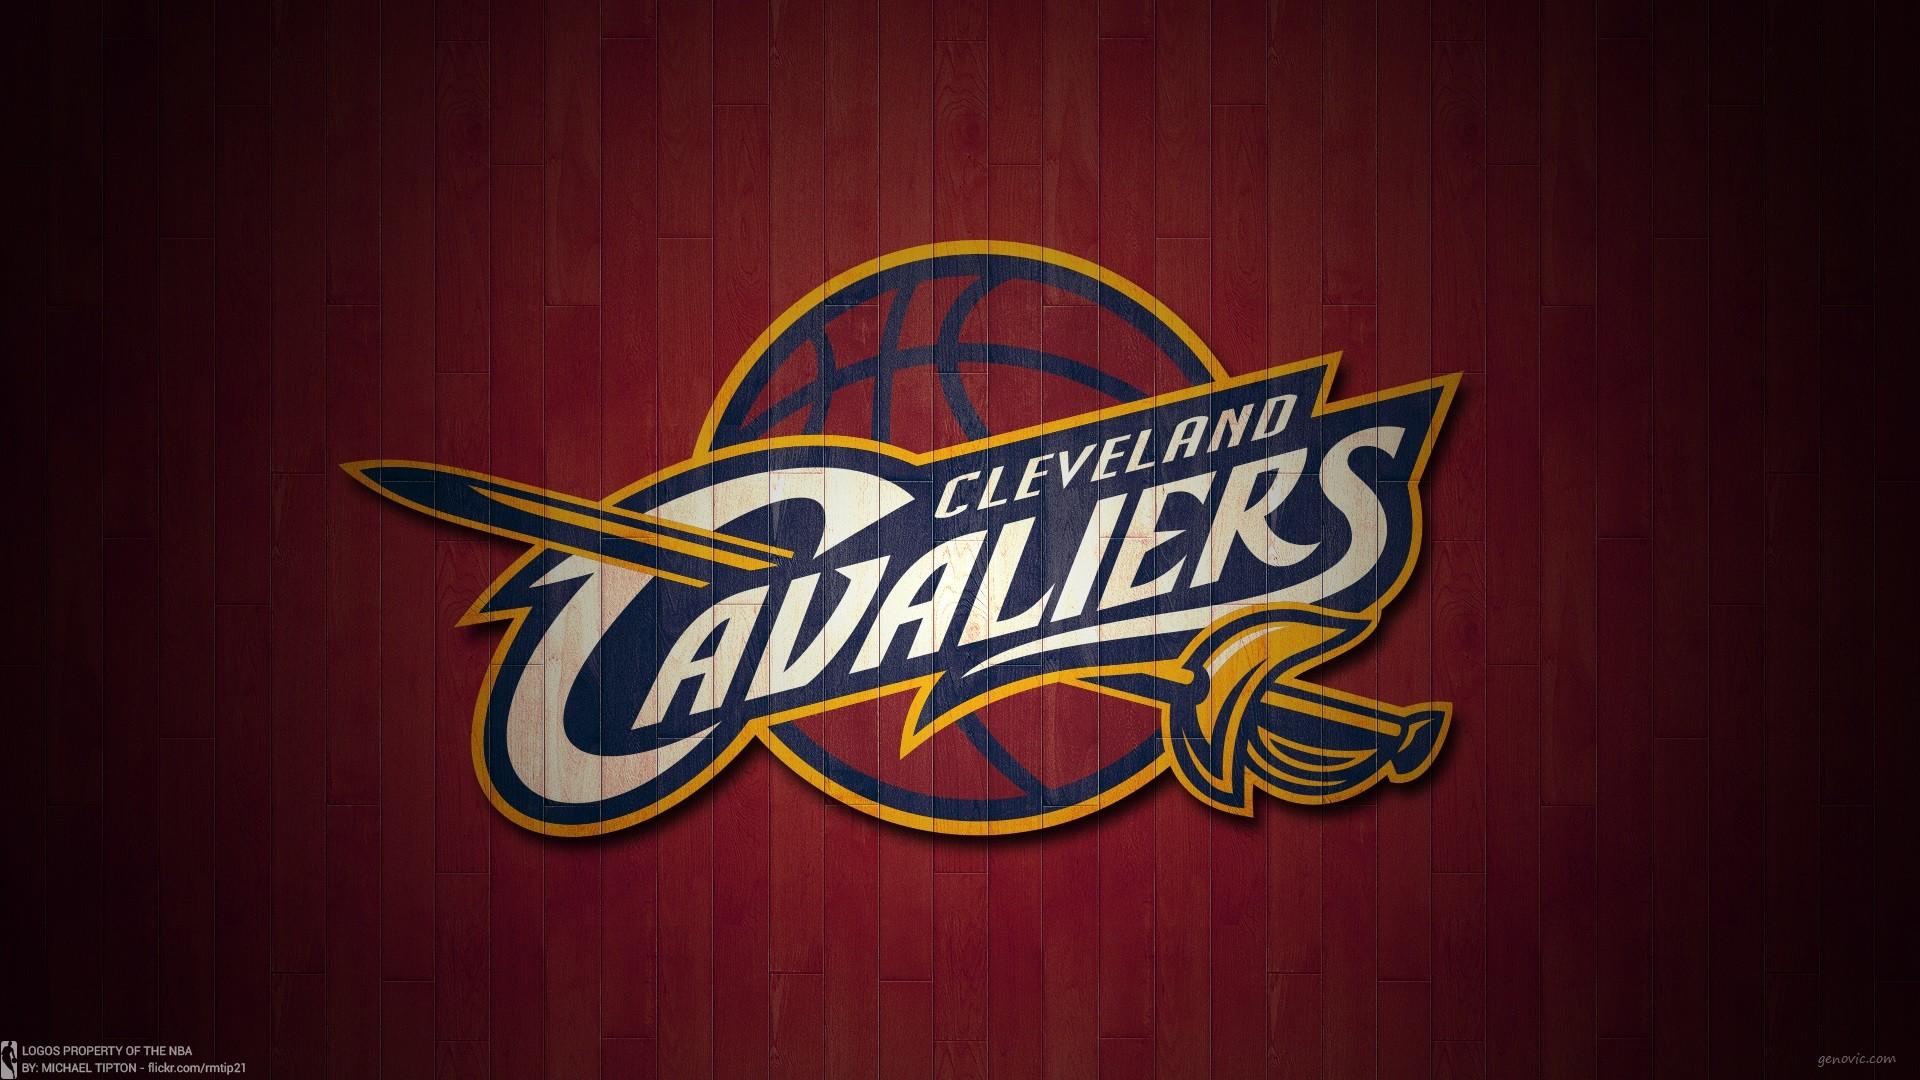 Cleveland Cavaliers HD Wallpaper